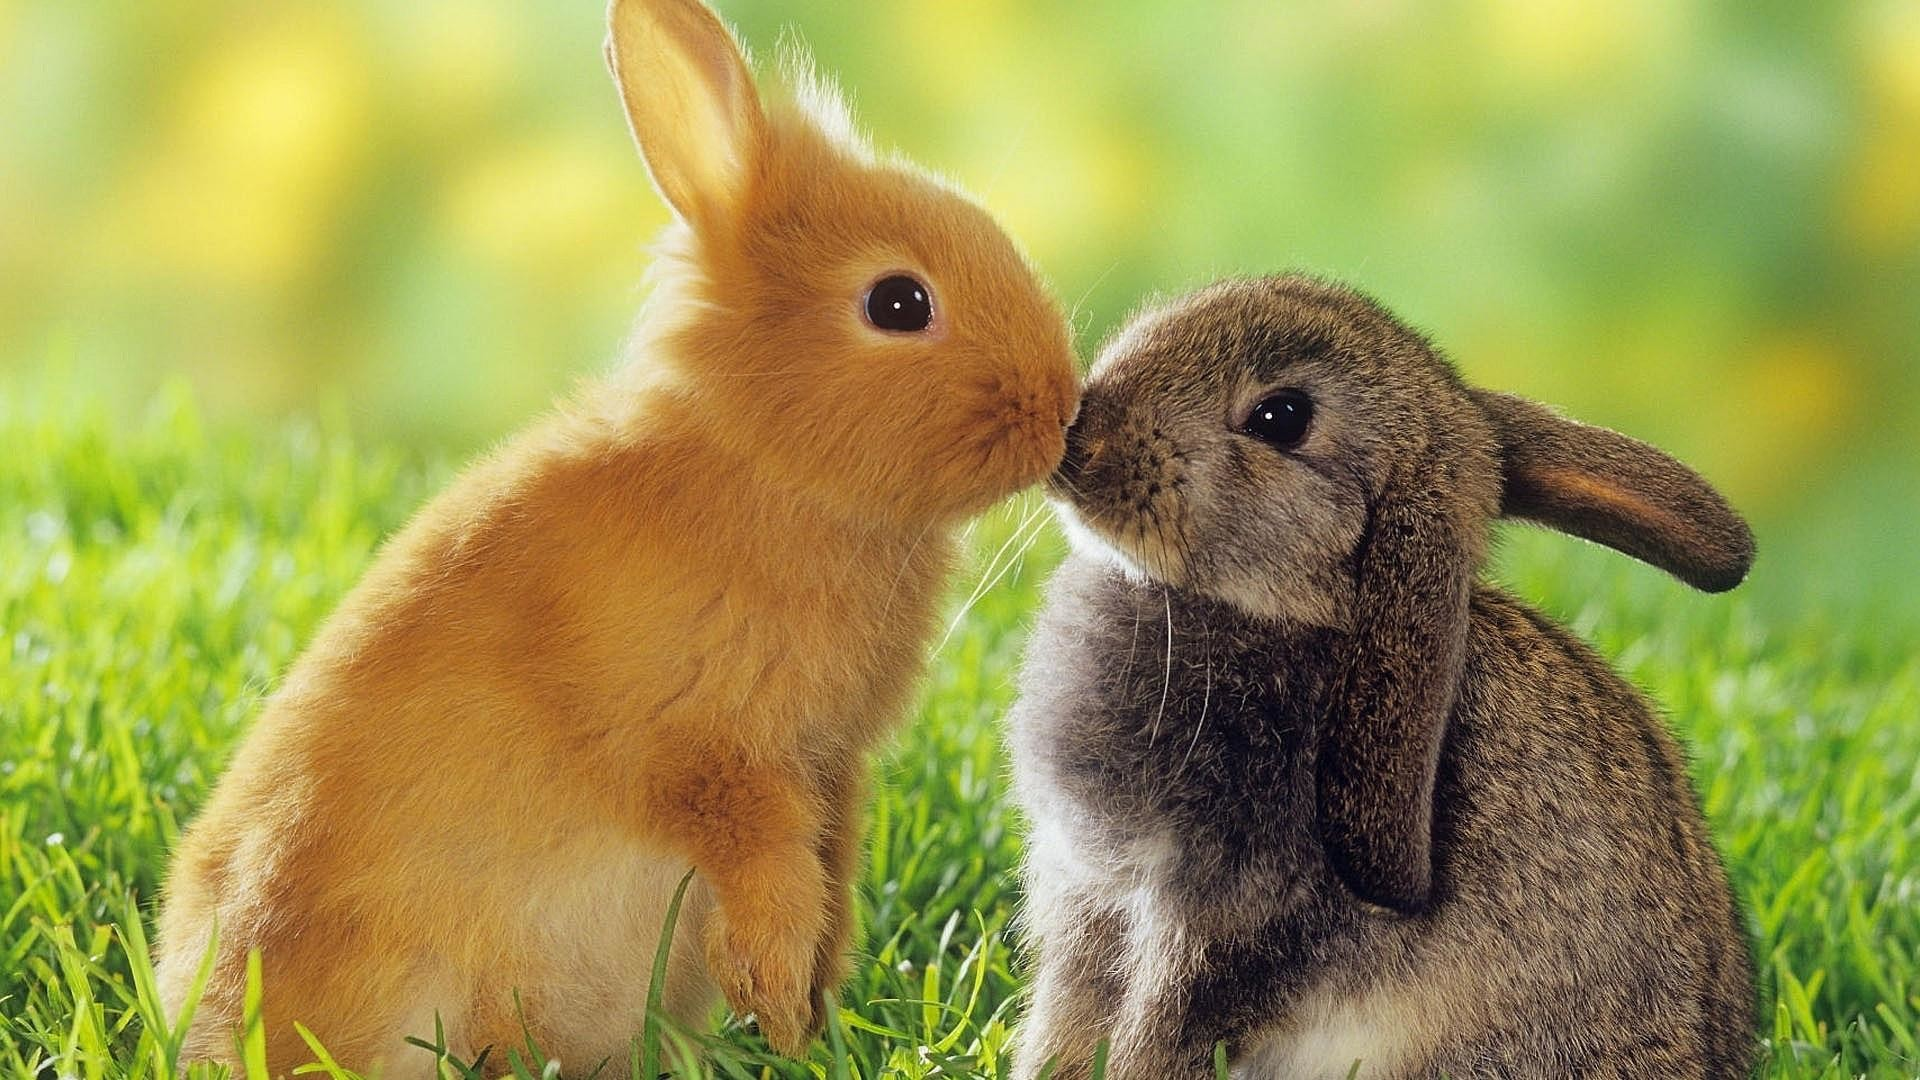 Baby Bunny Wallpaper 63 Pictures